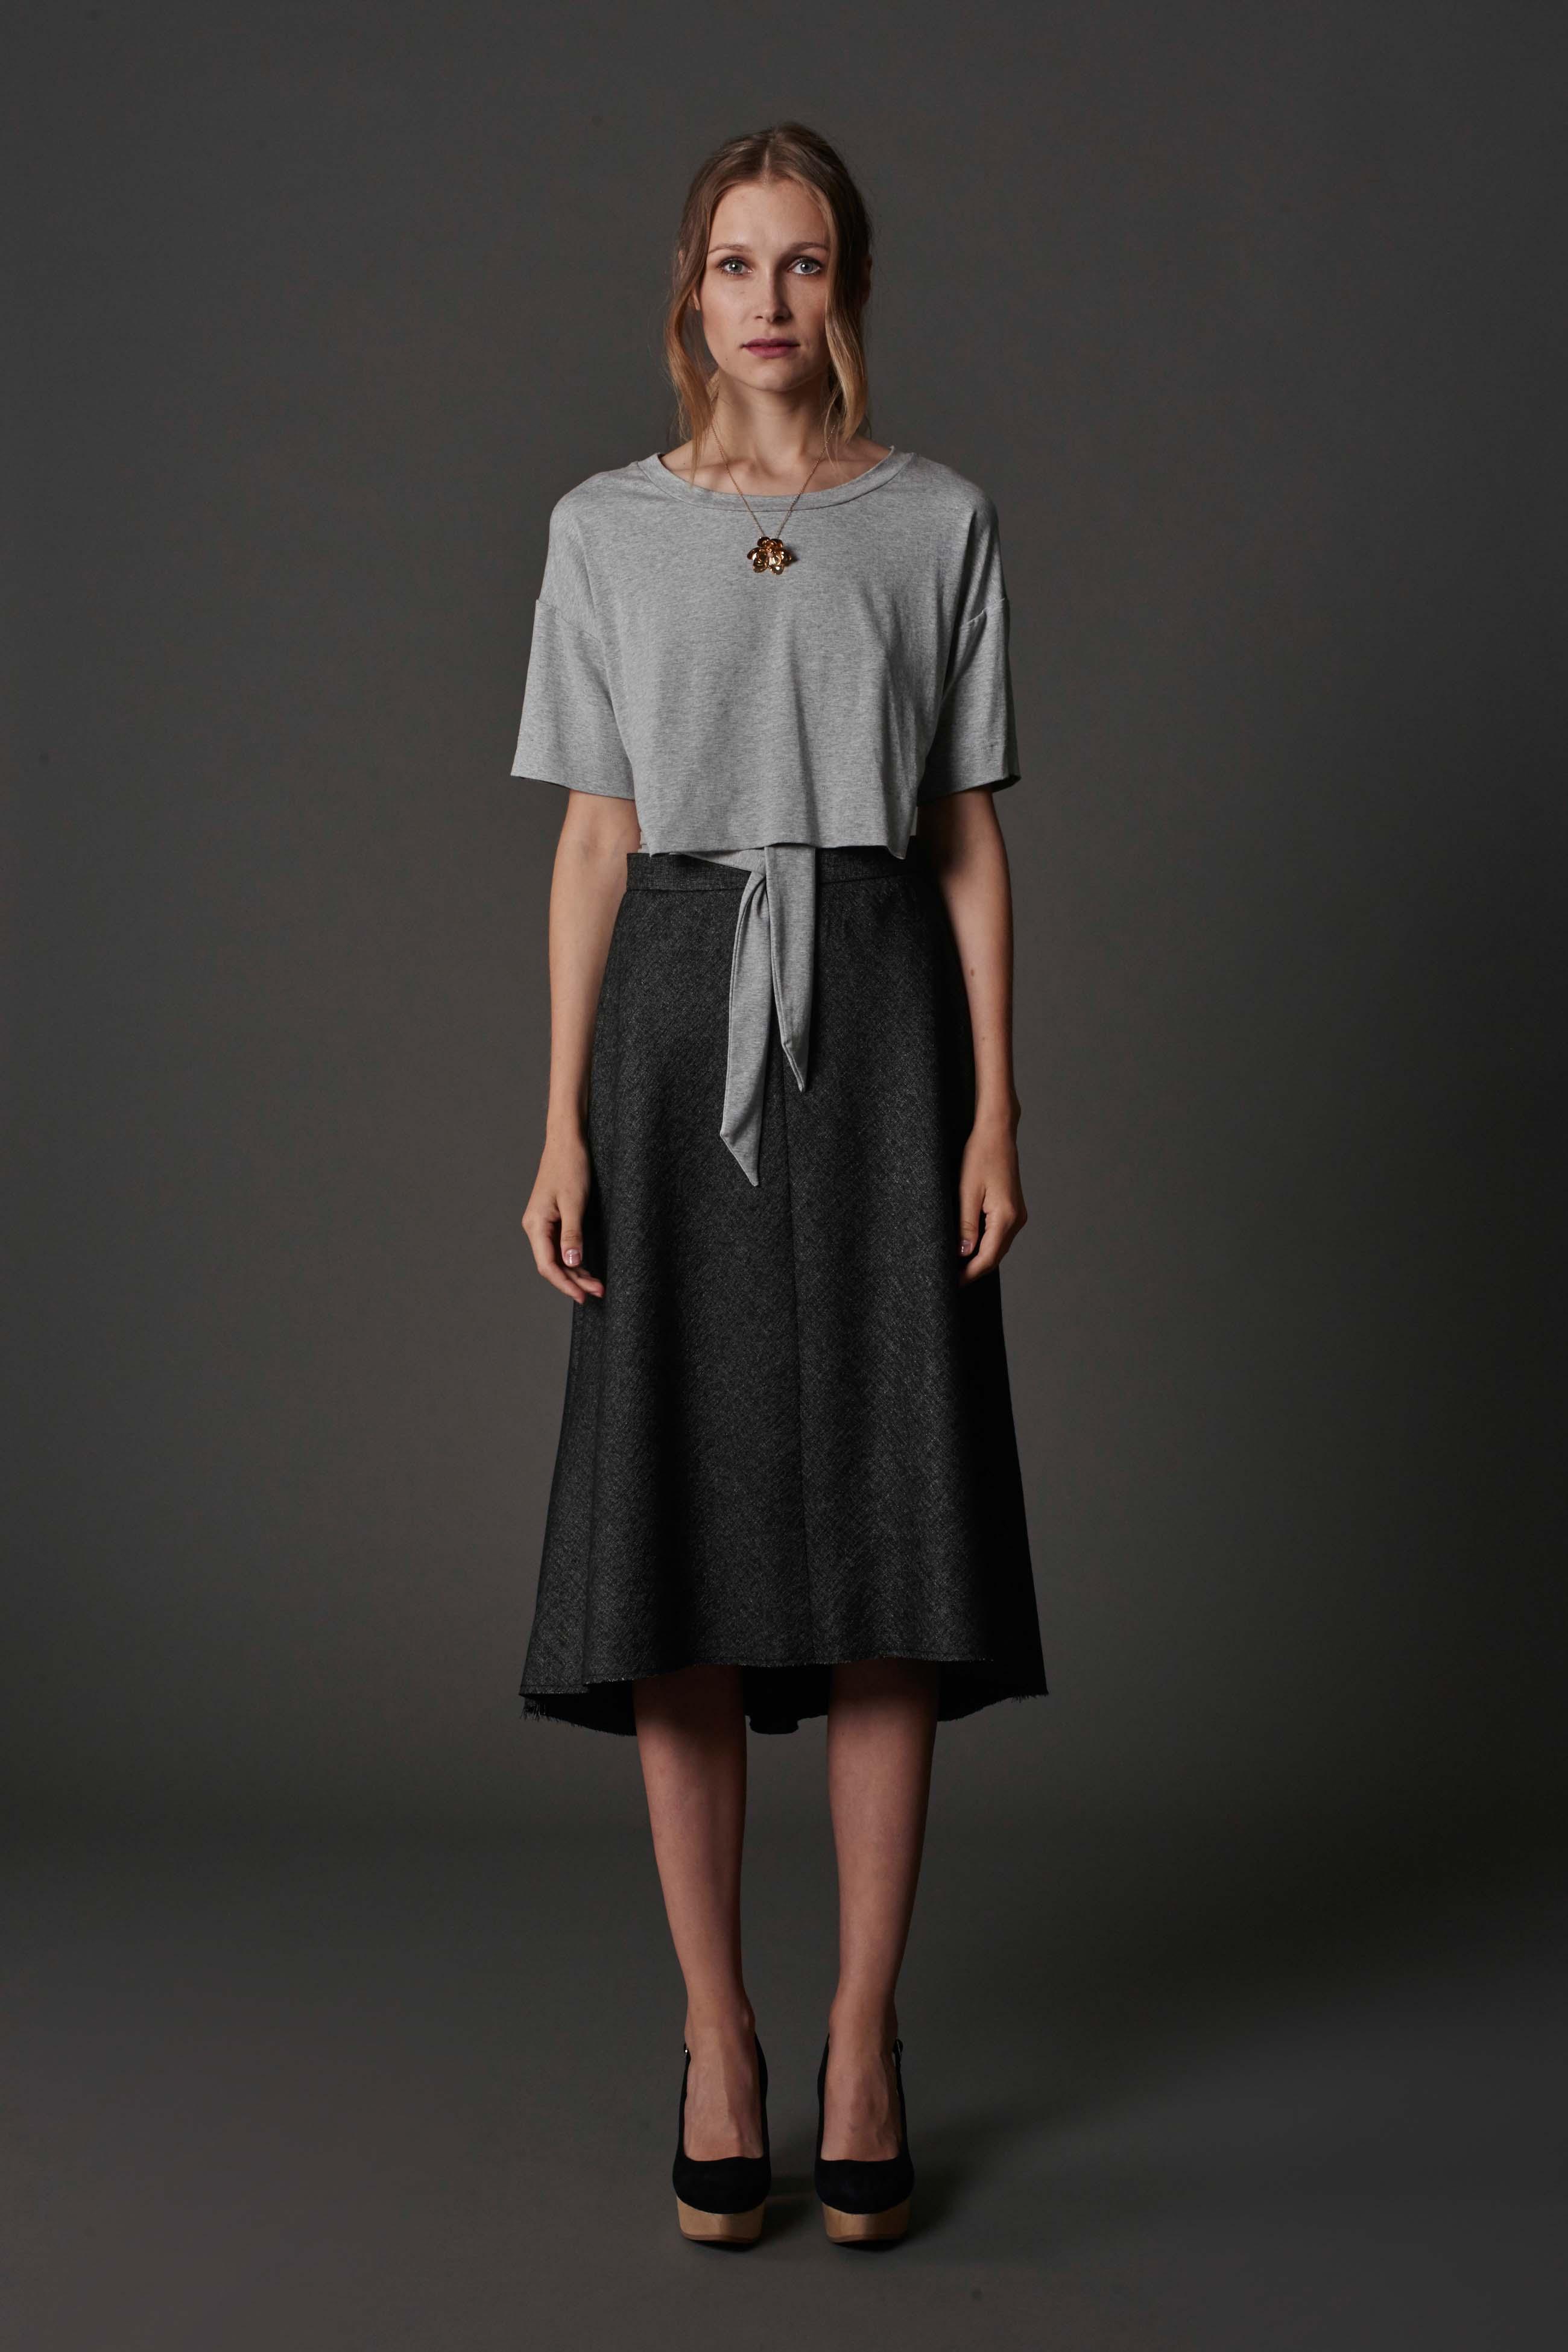 RUBY Alta Wrap T-Shirt, Malik Skirt & Halo Heel